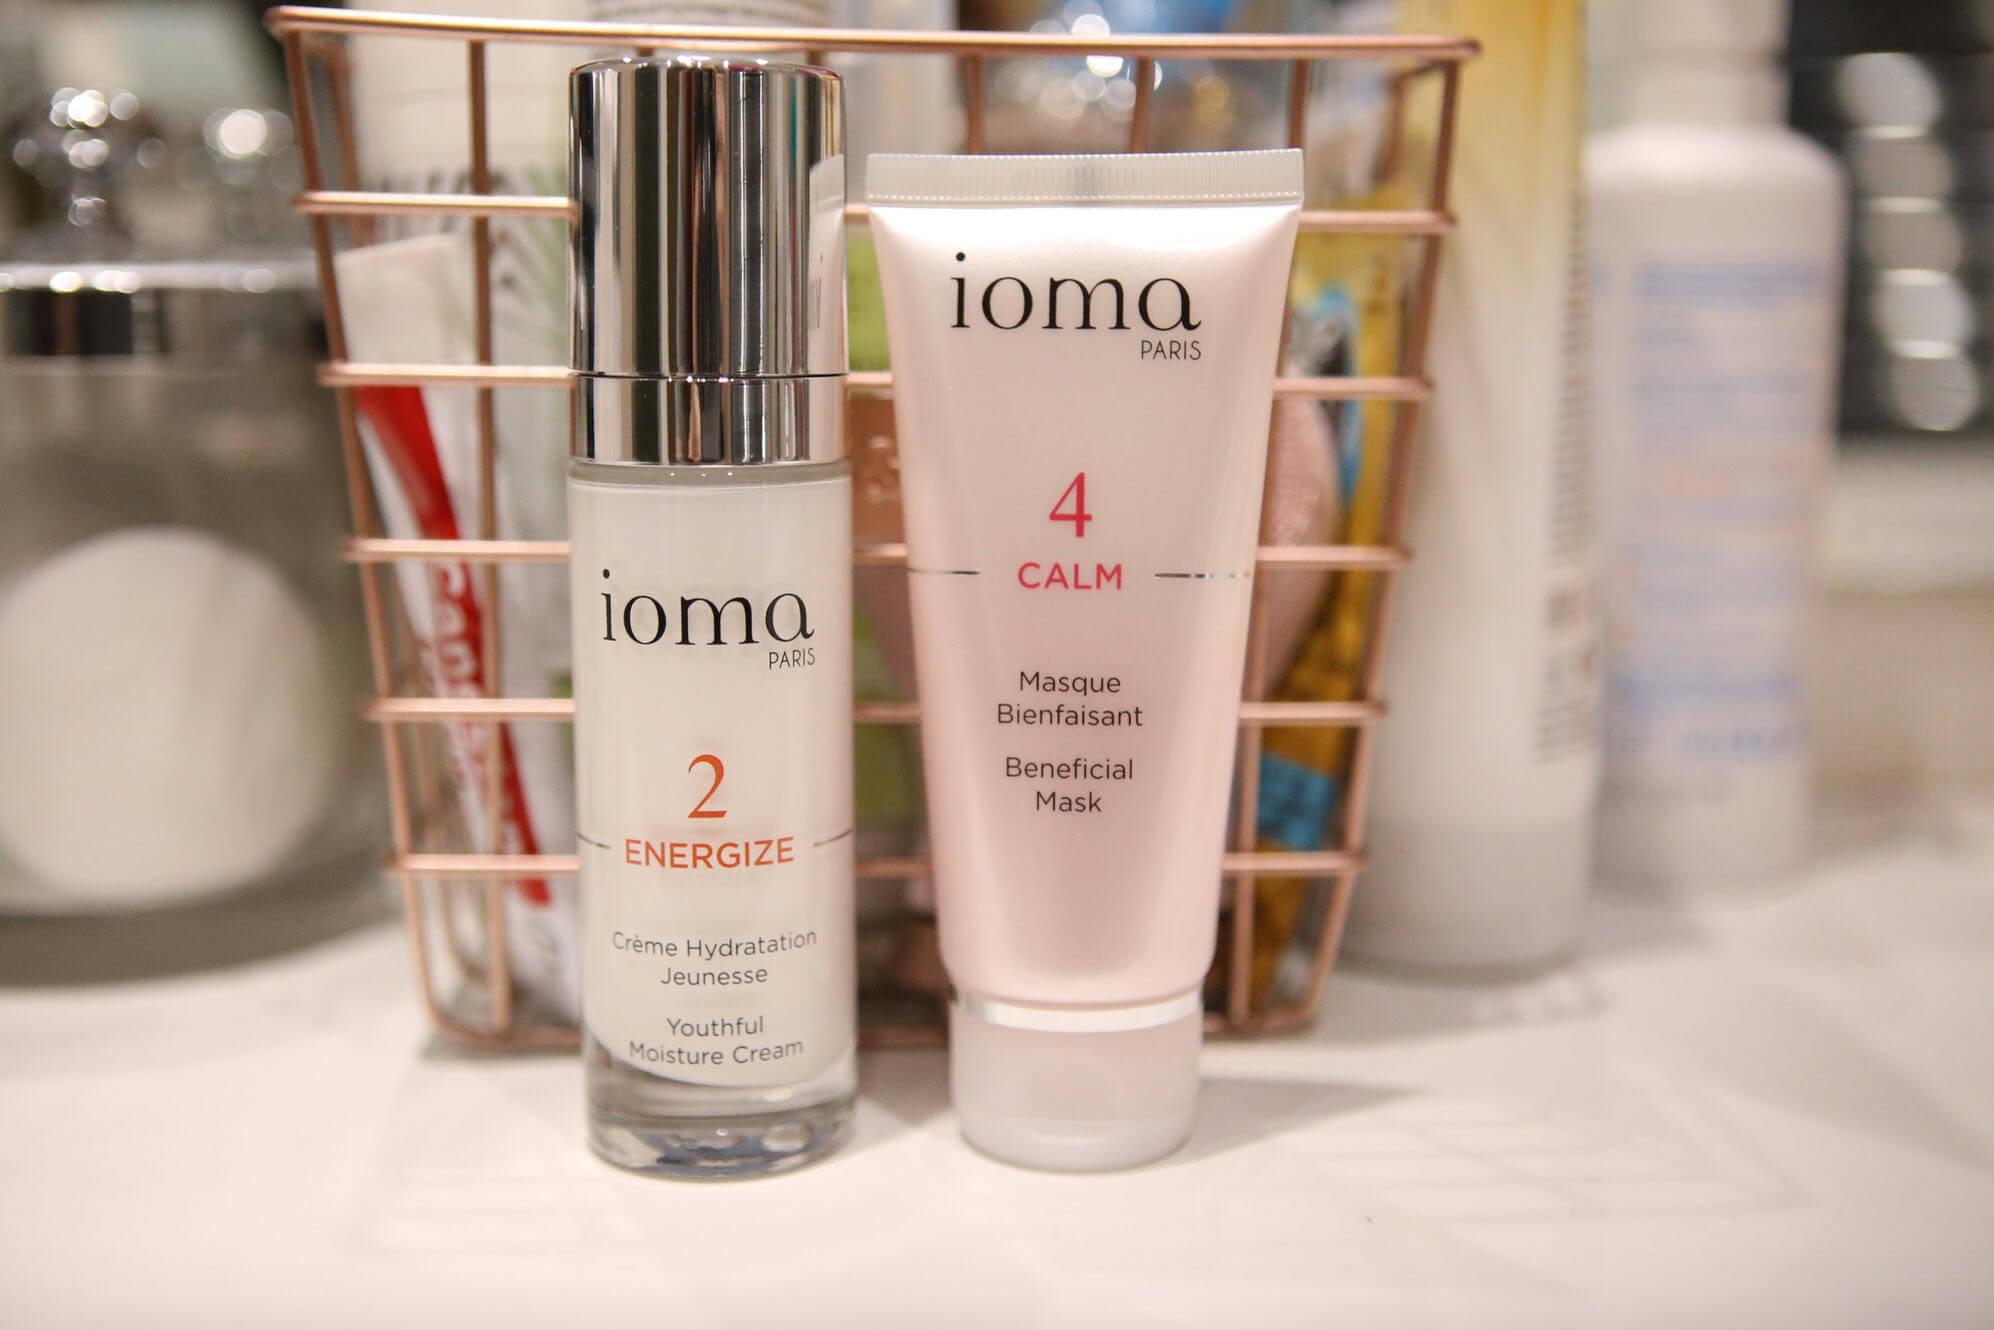 Ioma Skincare including a calming masque and a youthful moisture cream